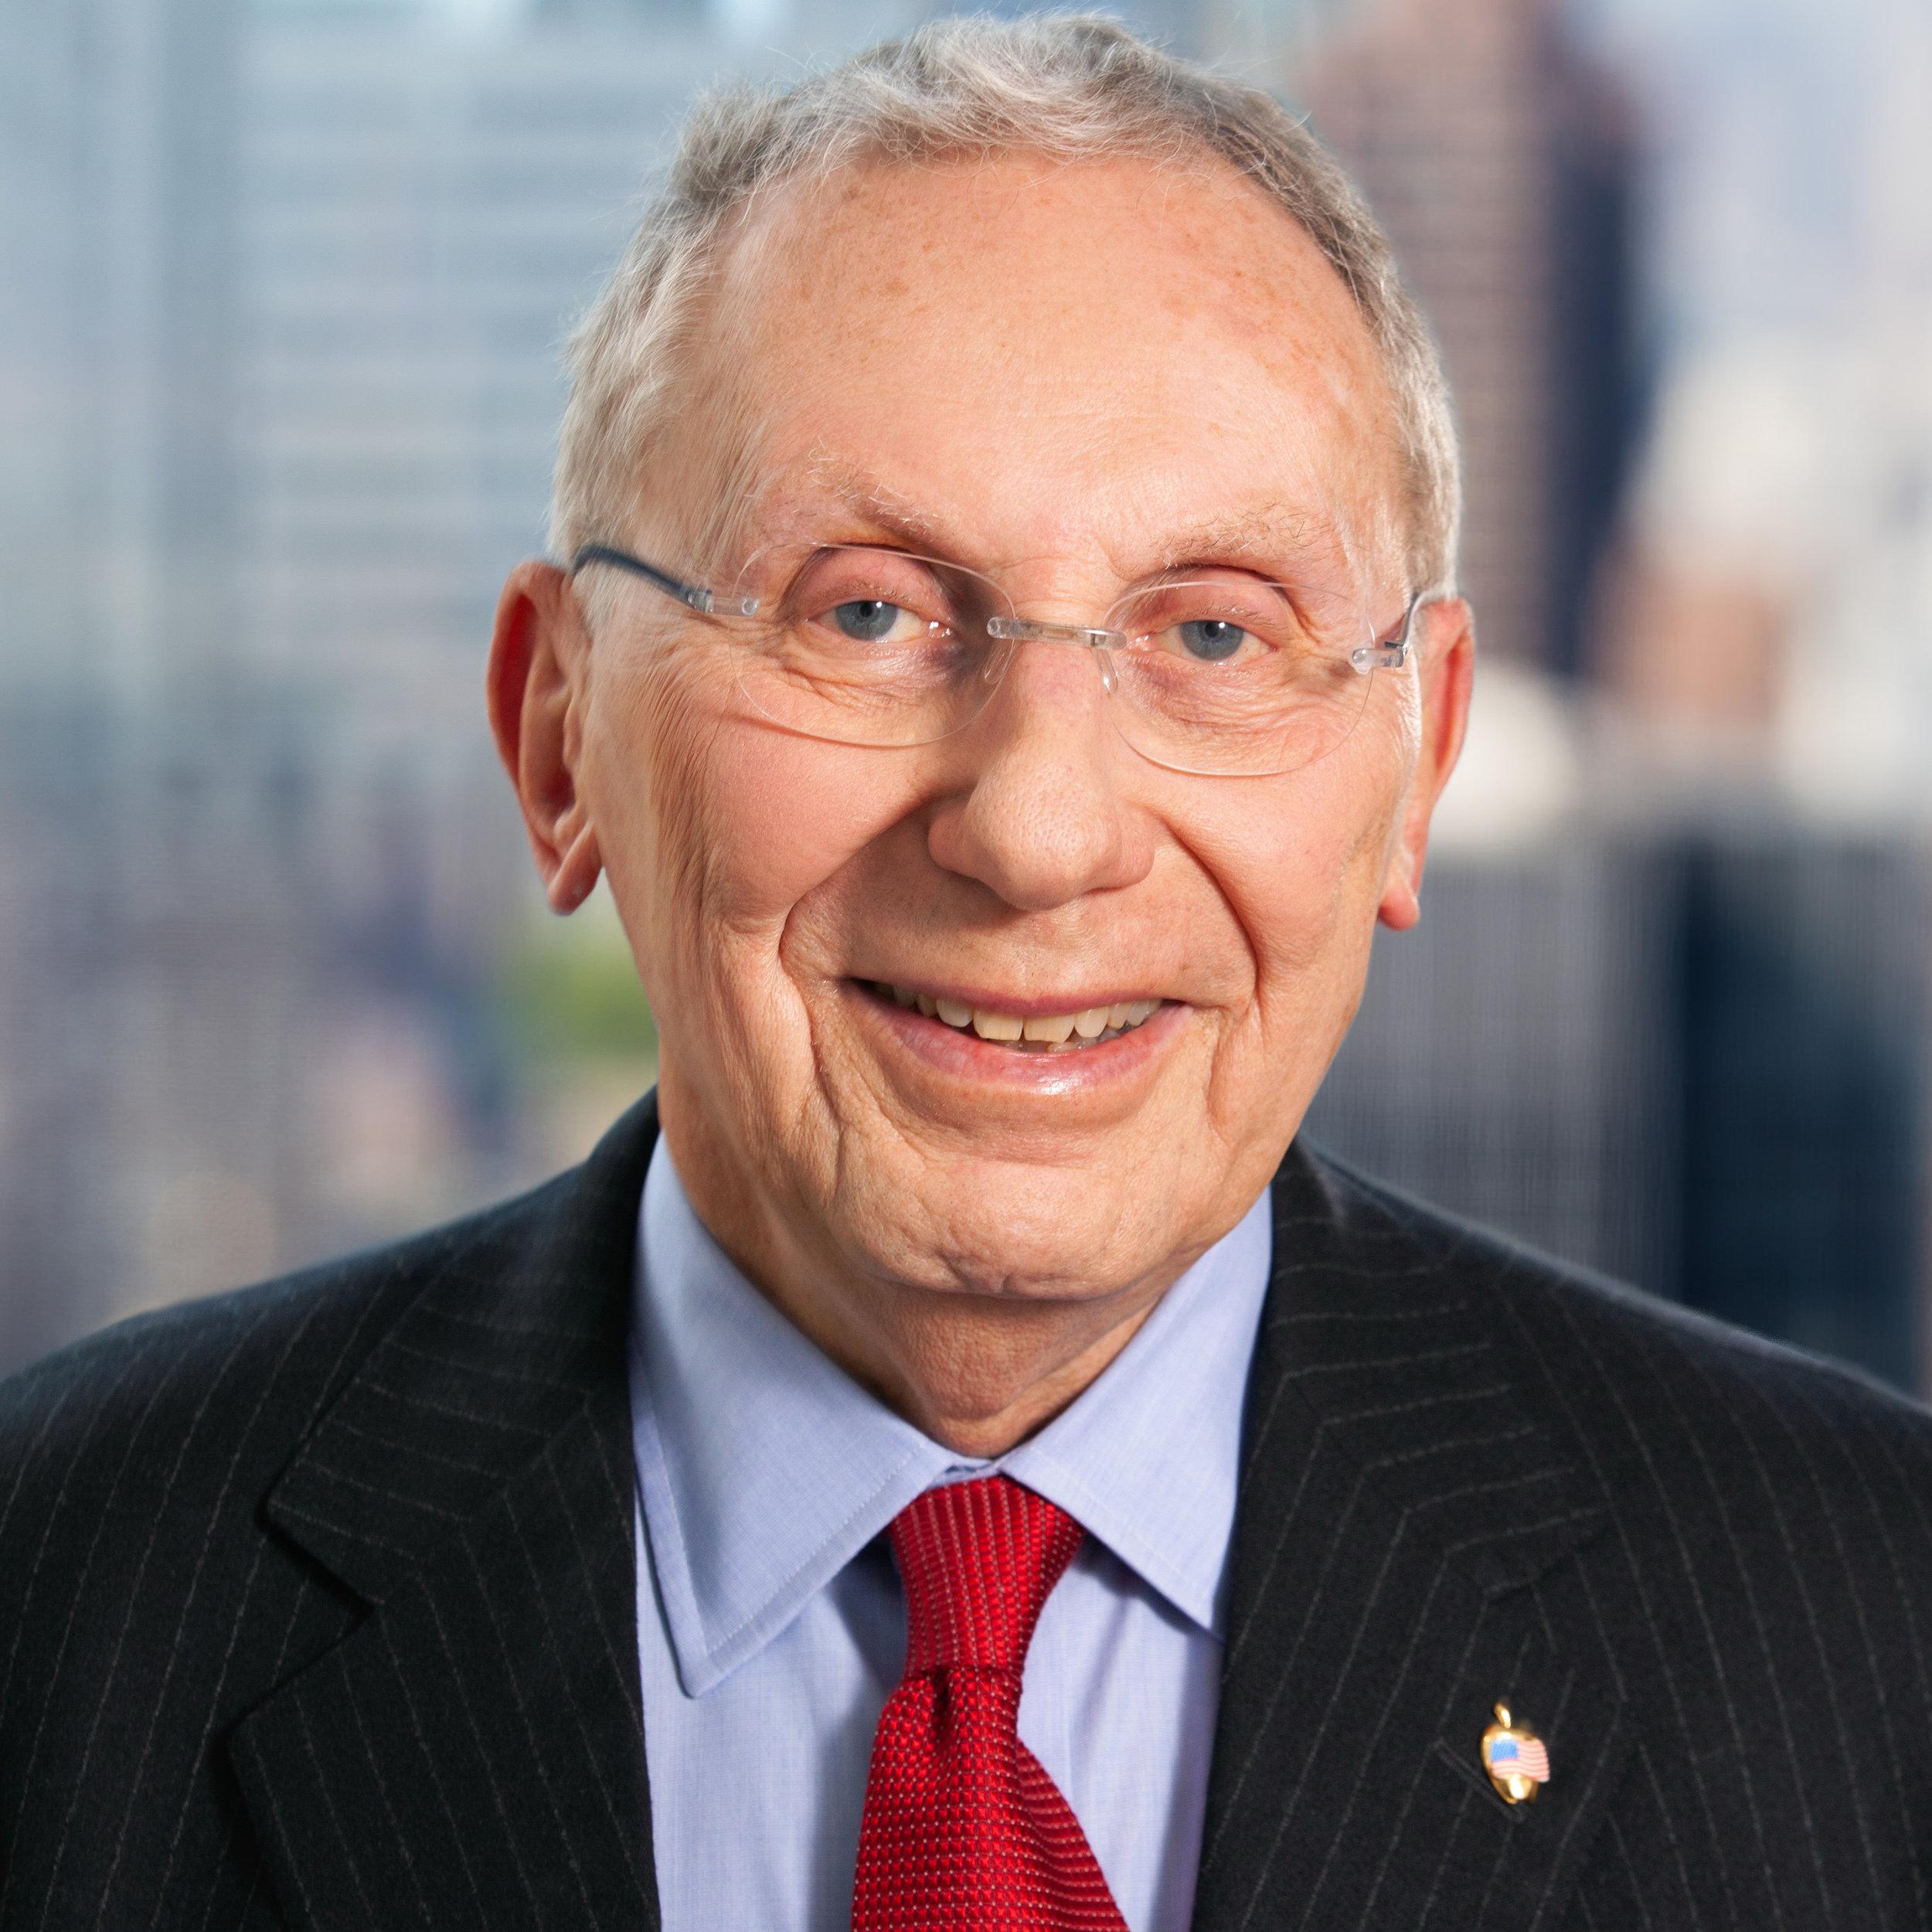 Sam S. Perelson, CPA - 1935—2019Former Managing Partner Emeritus